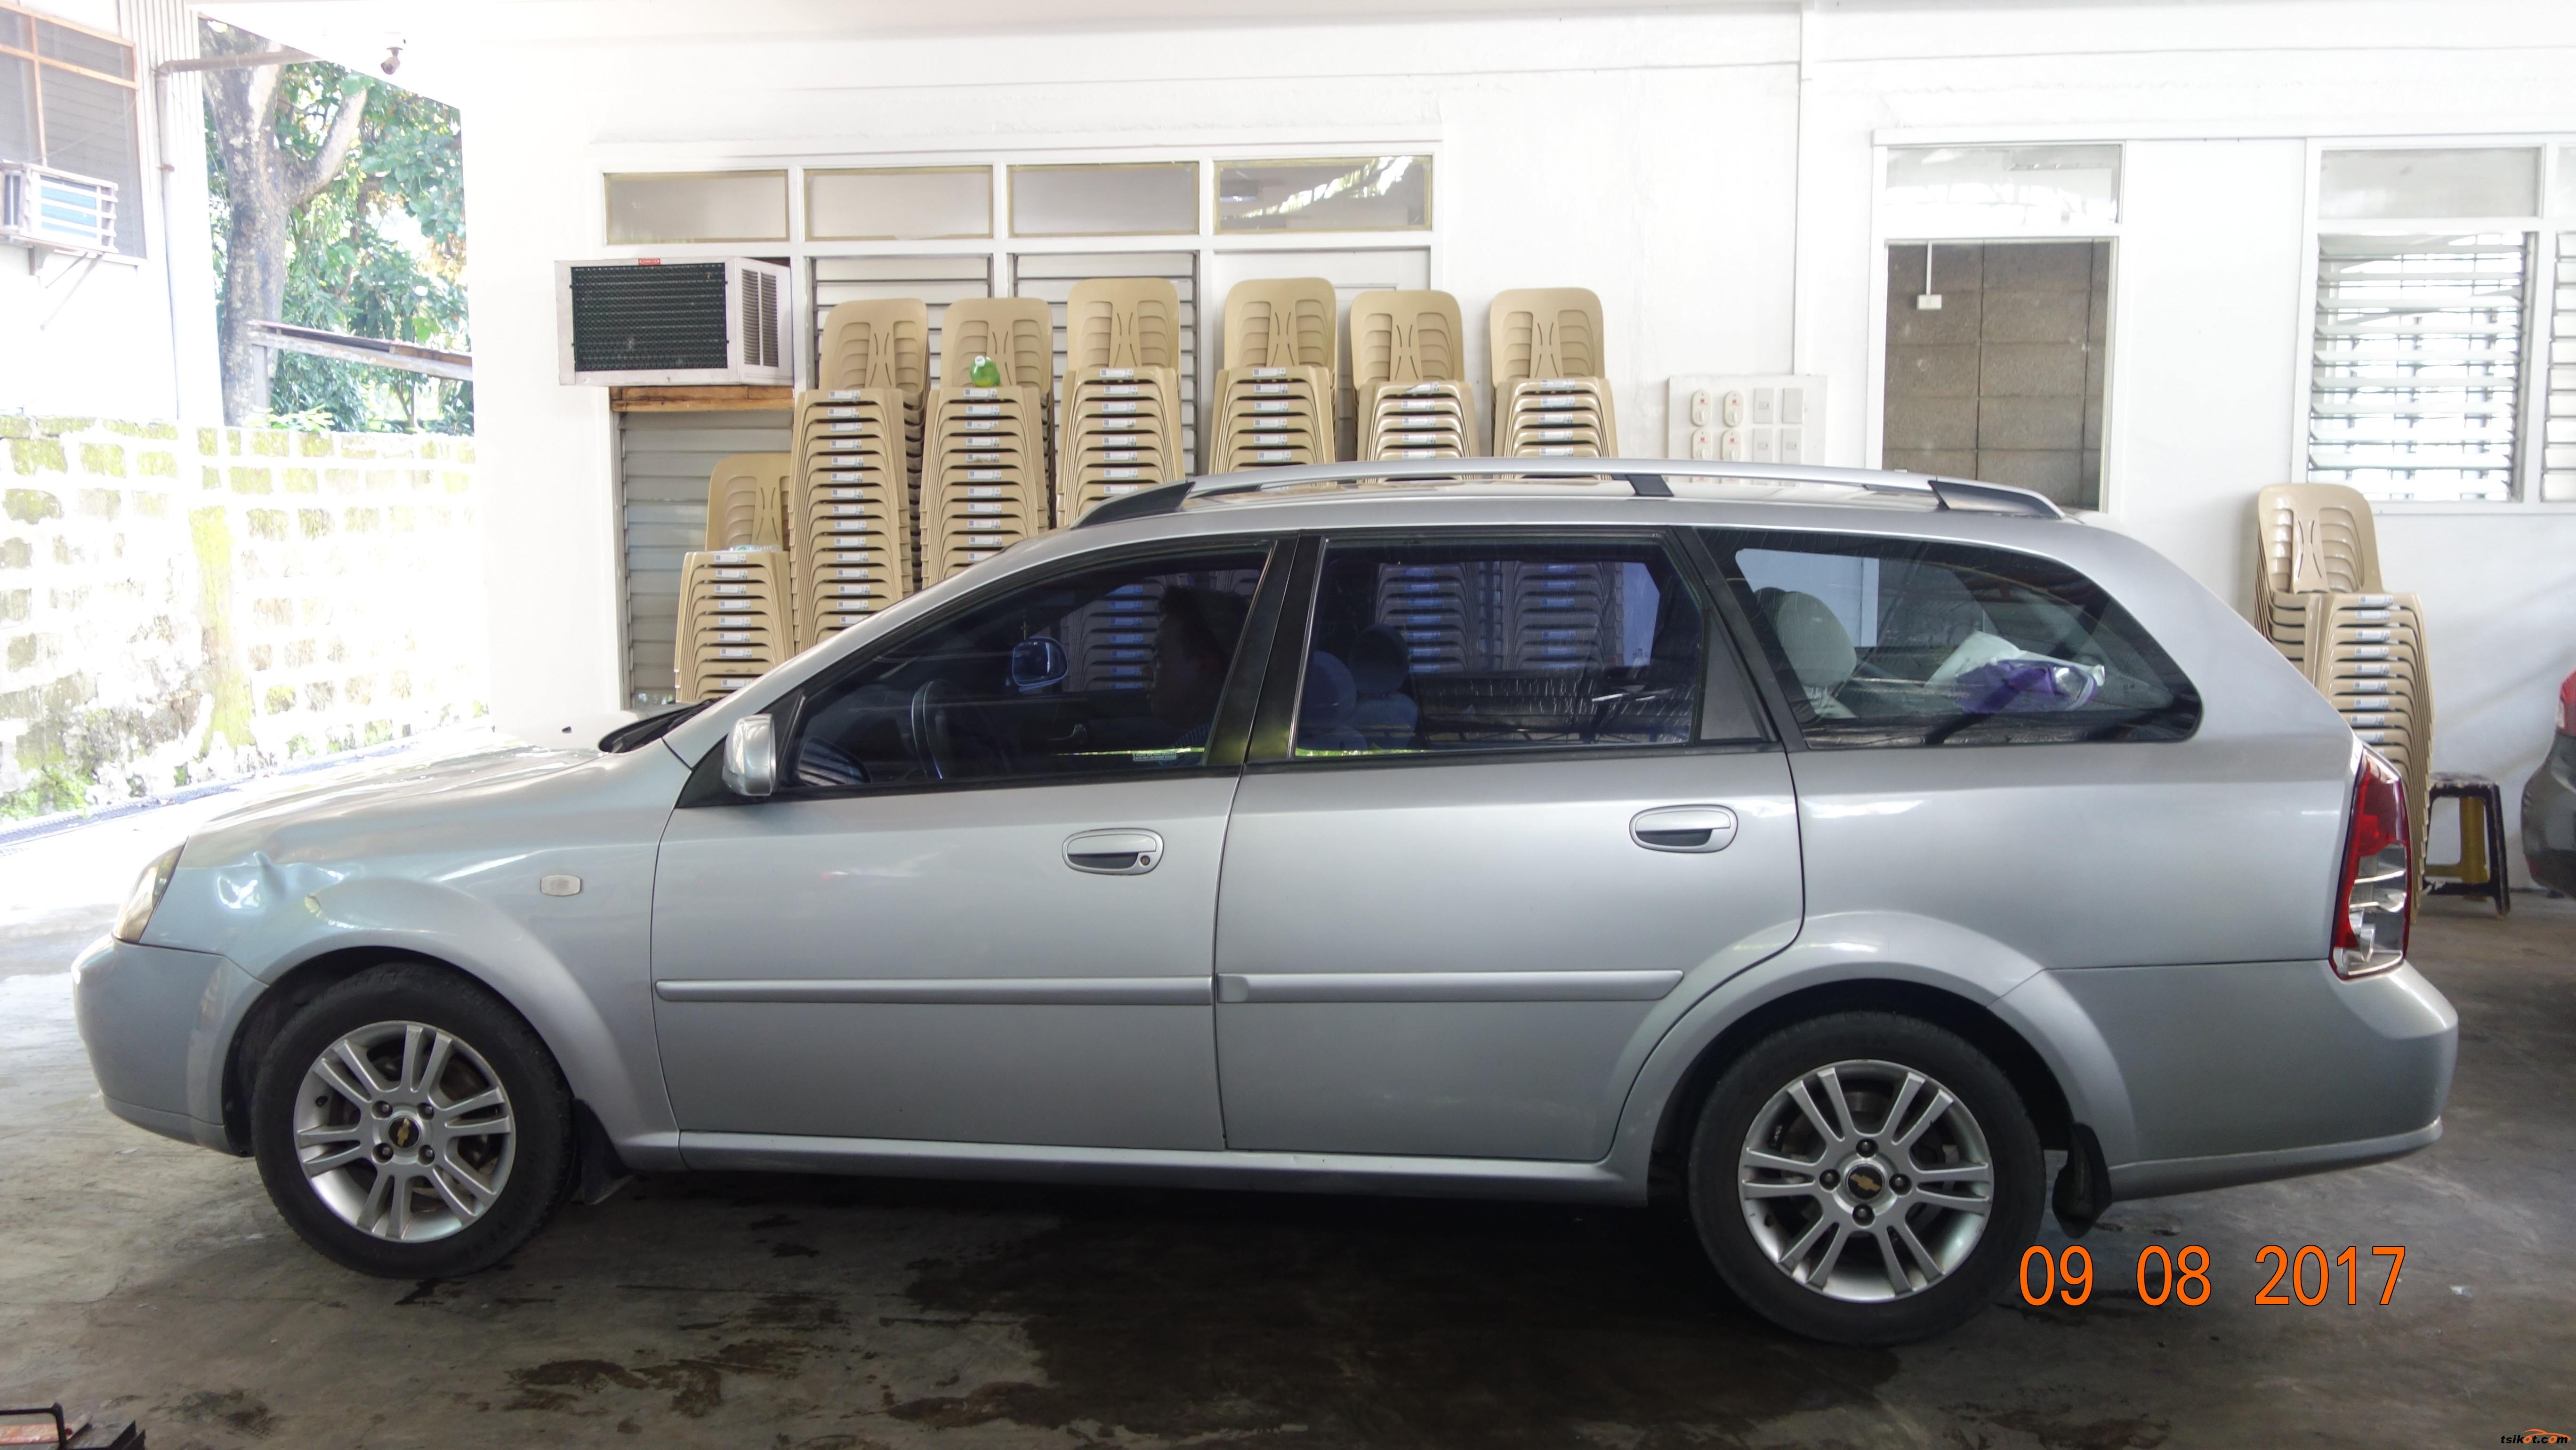 Chevrolet Optra 2006 - 8